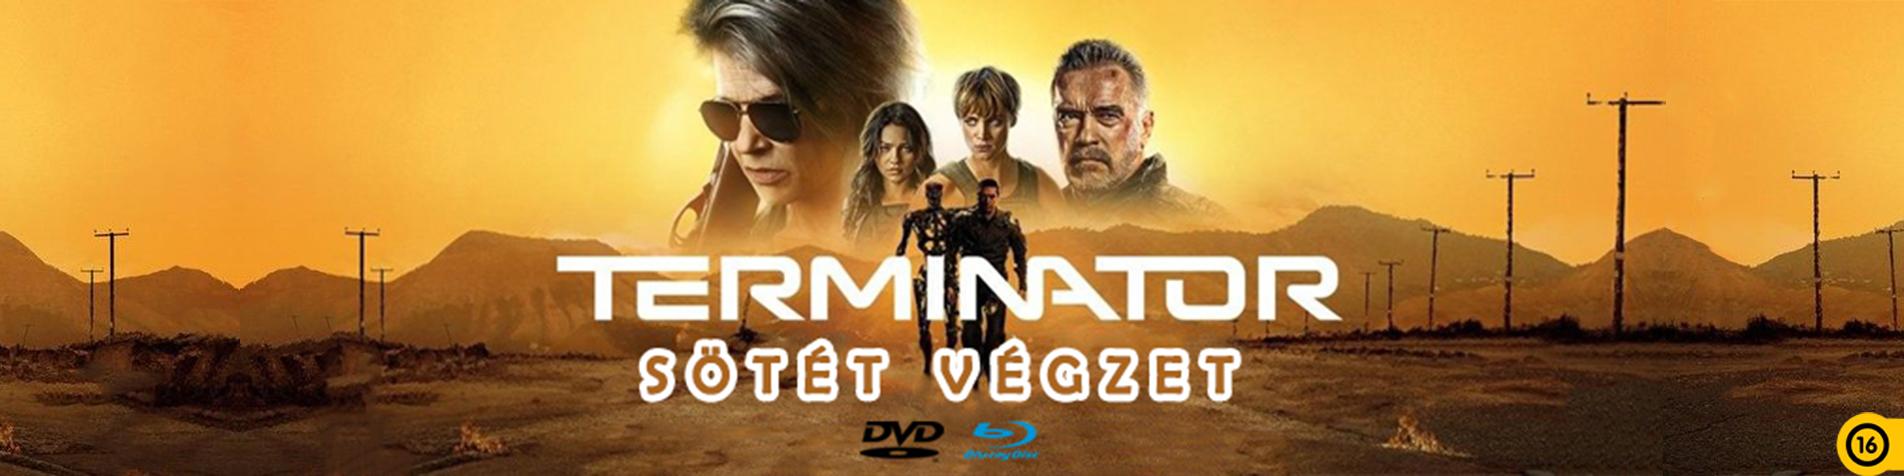 Terminator - Bluray